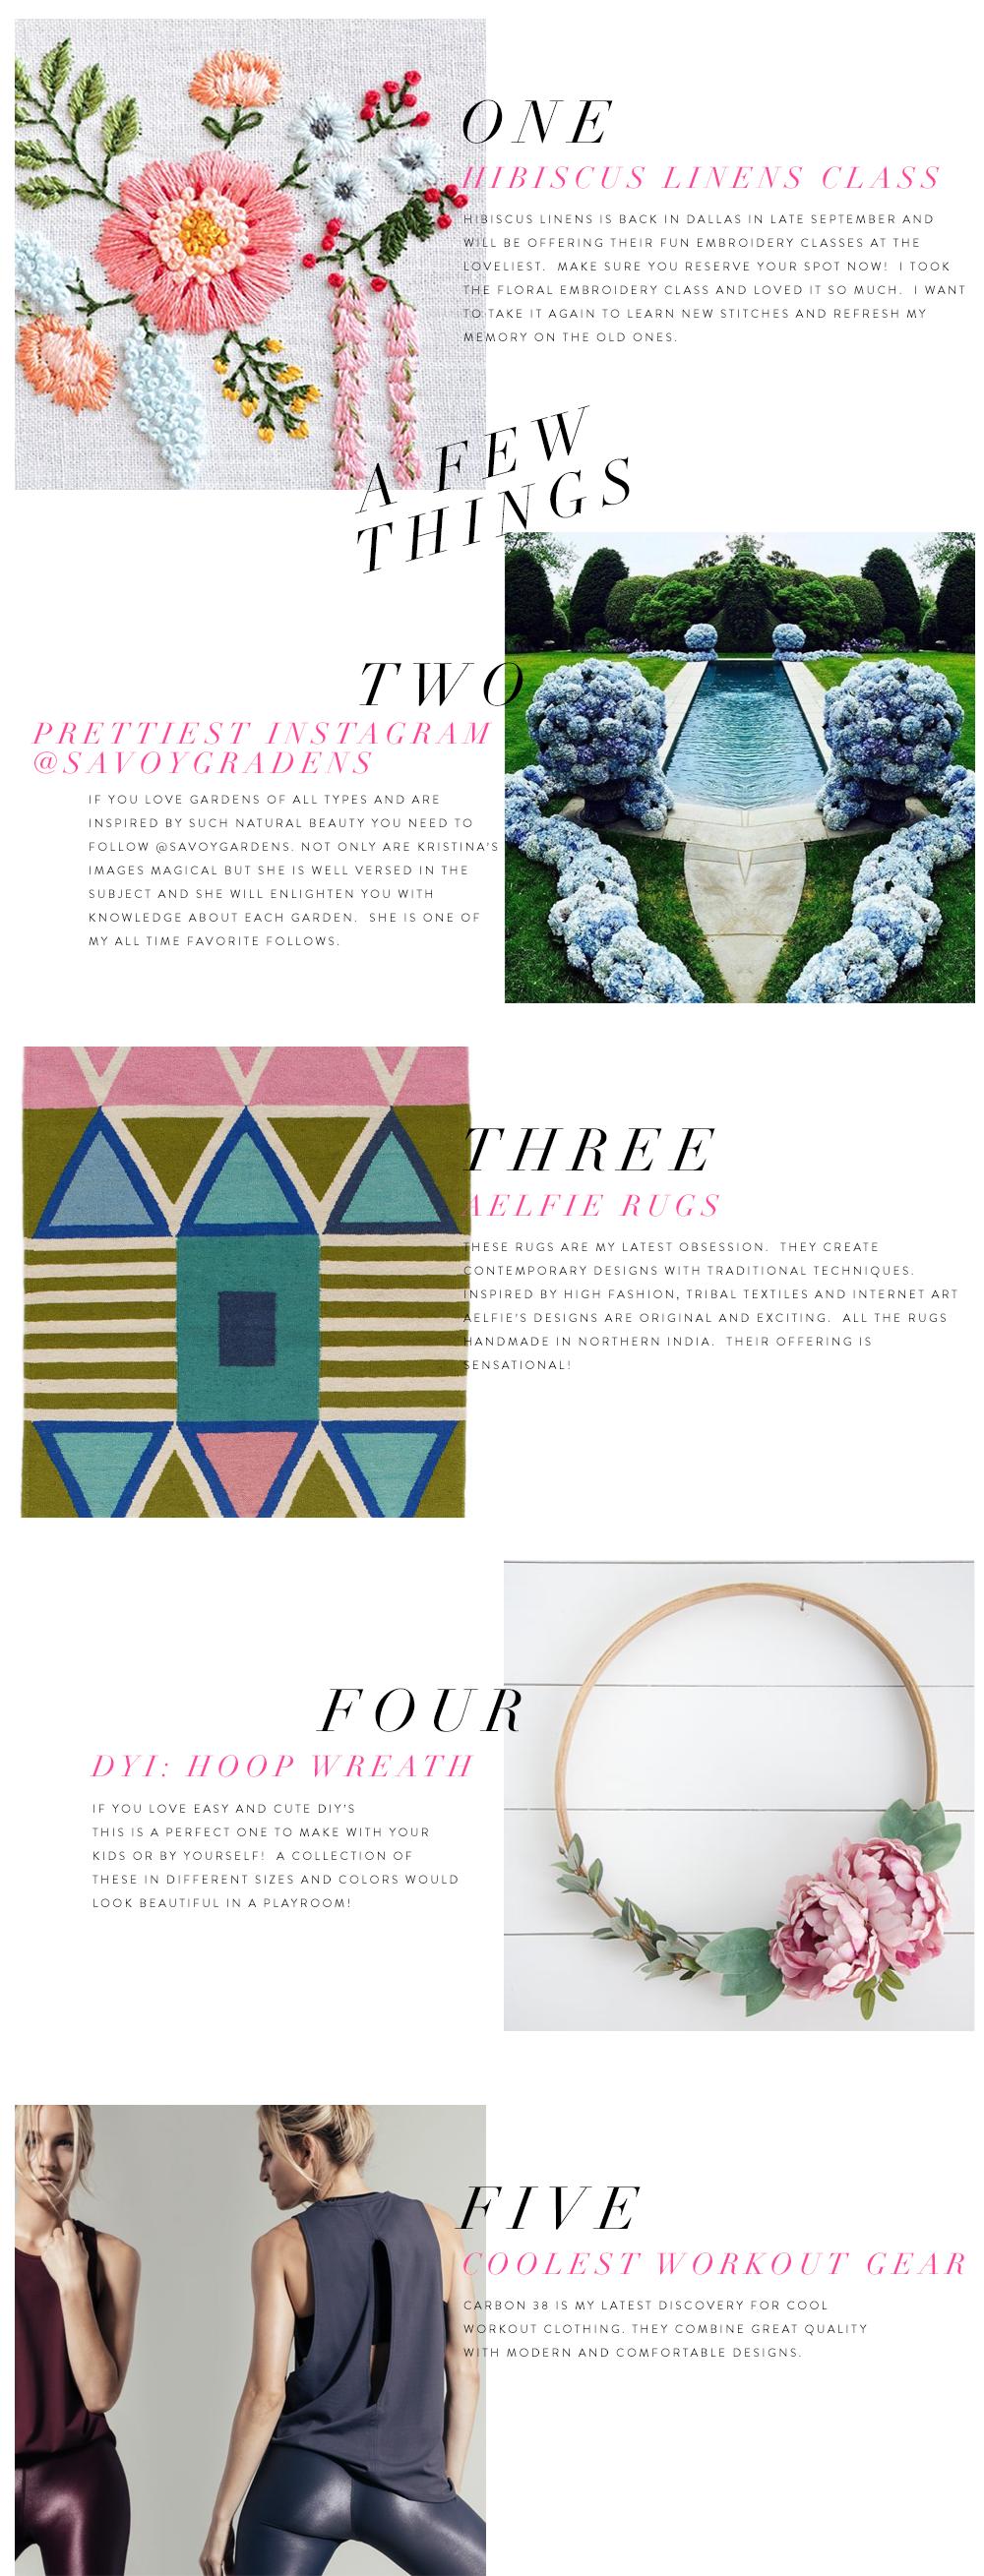 Mimosa Lane blog, hibisucs linens, savoy gardens, aelfie rugs, carbon 38